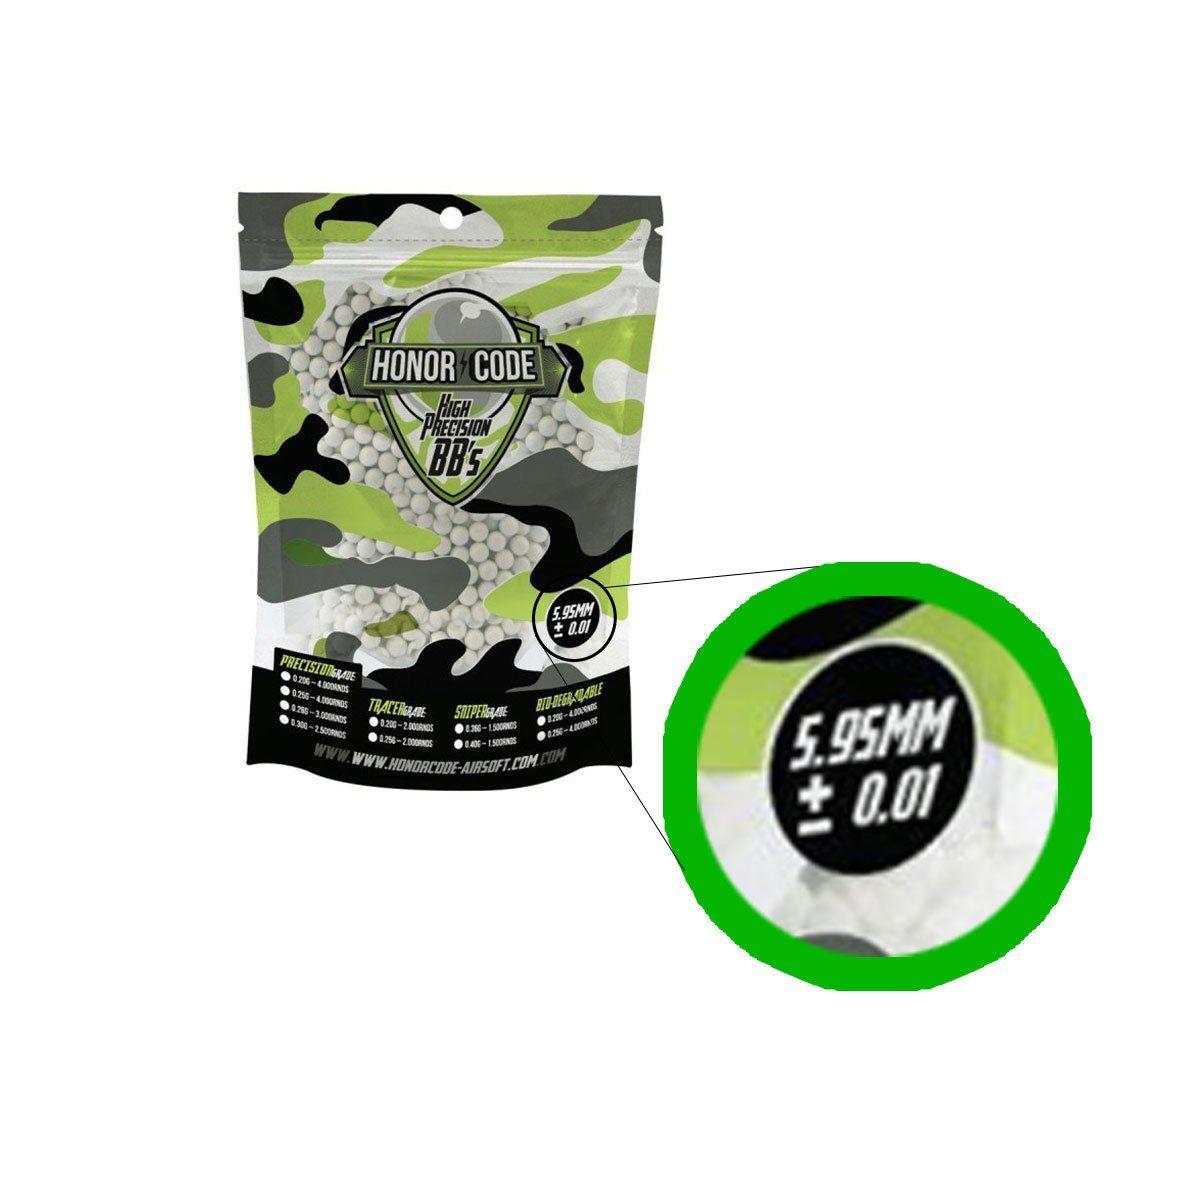 Municao/Esferas BBs 0,20 Honor Code 4000 unidades